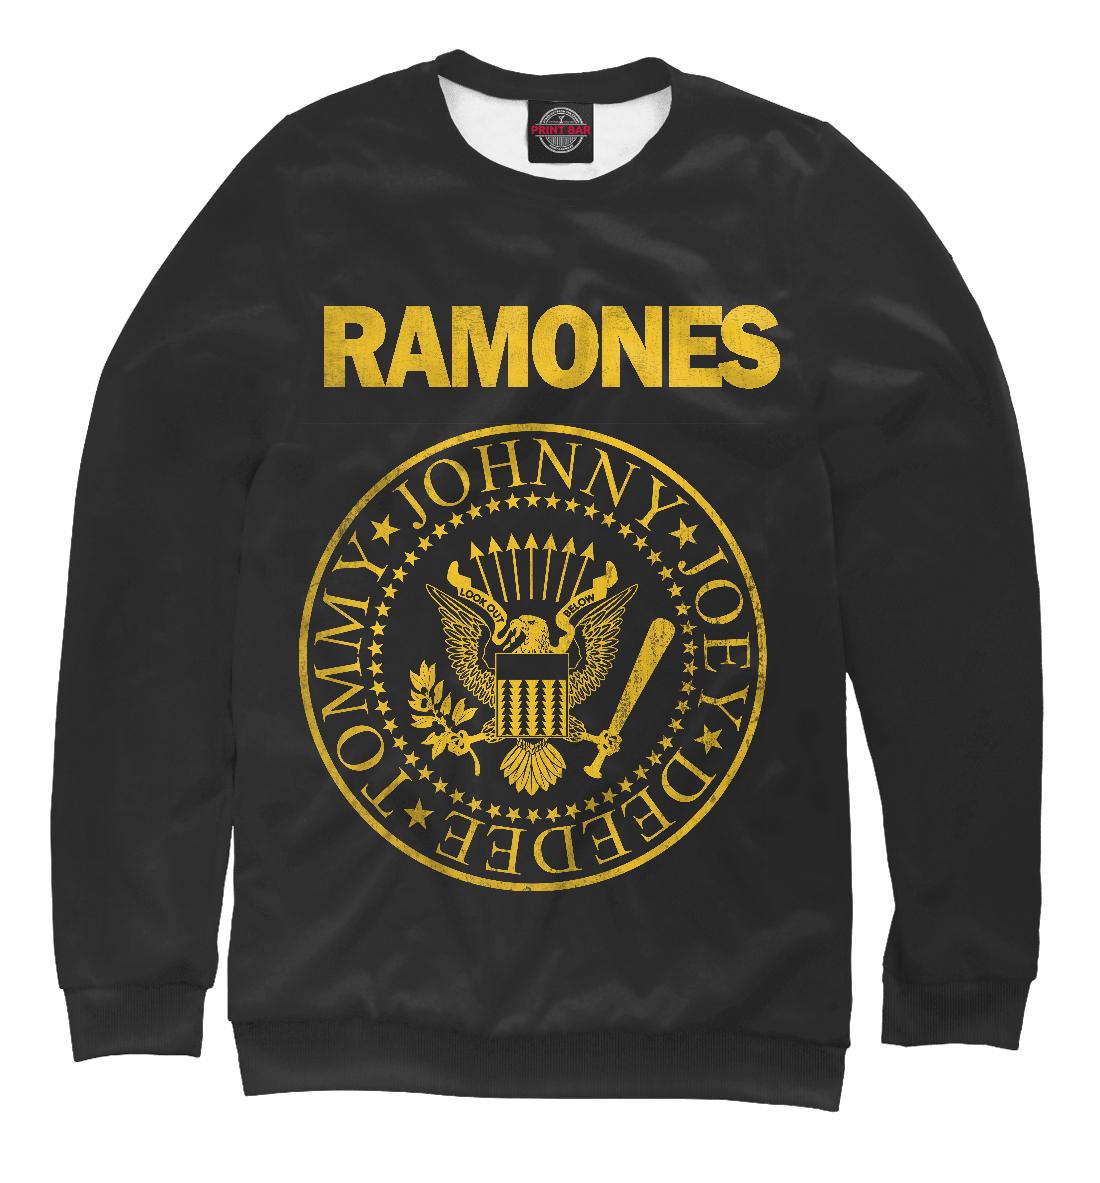 Купить Ramones Gold, Printbar, Свитшоты, RMN-906463-swi-2